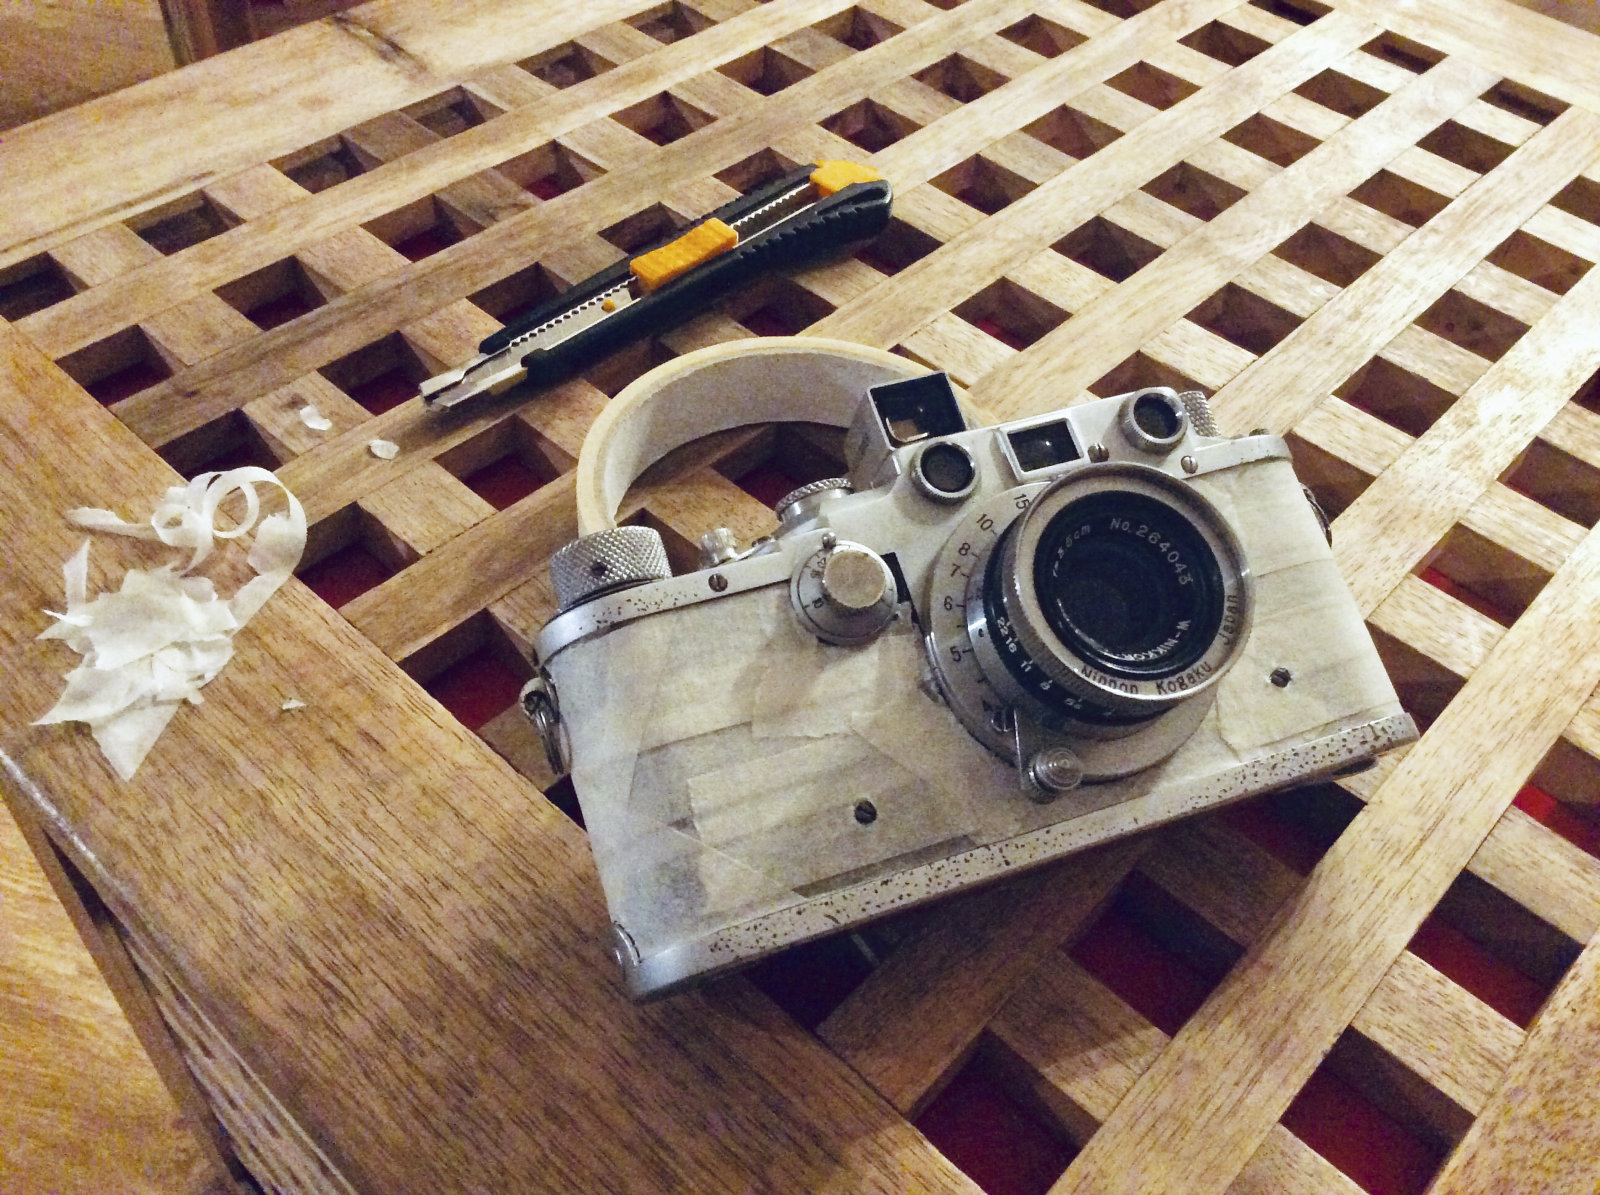 Leica vulcanite replacement